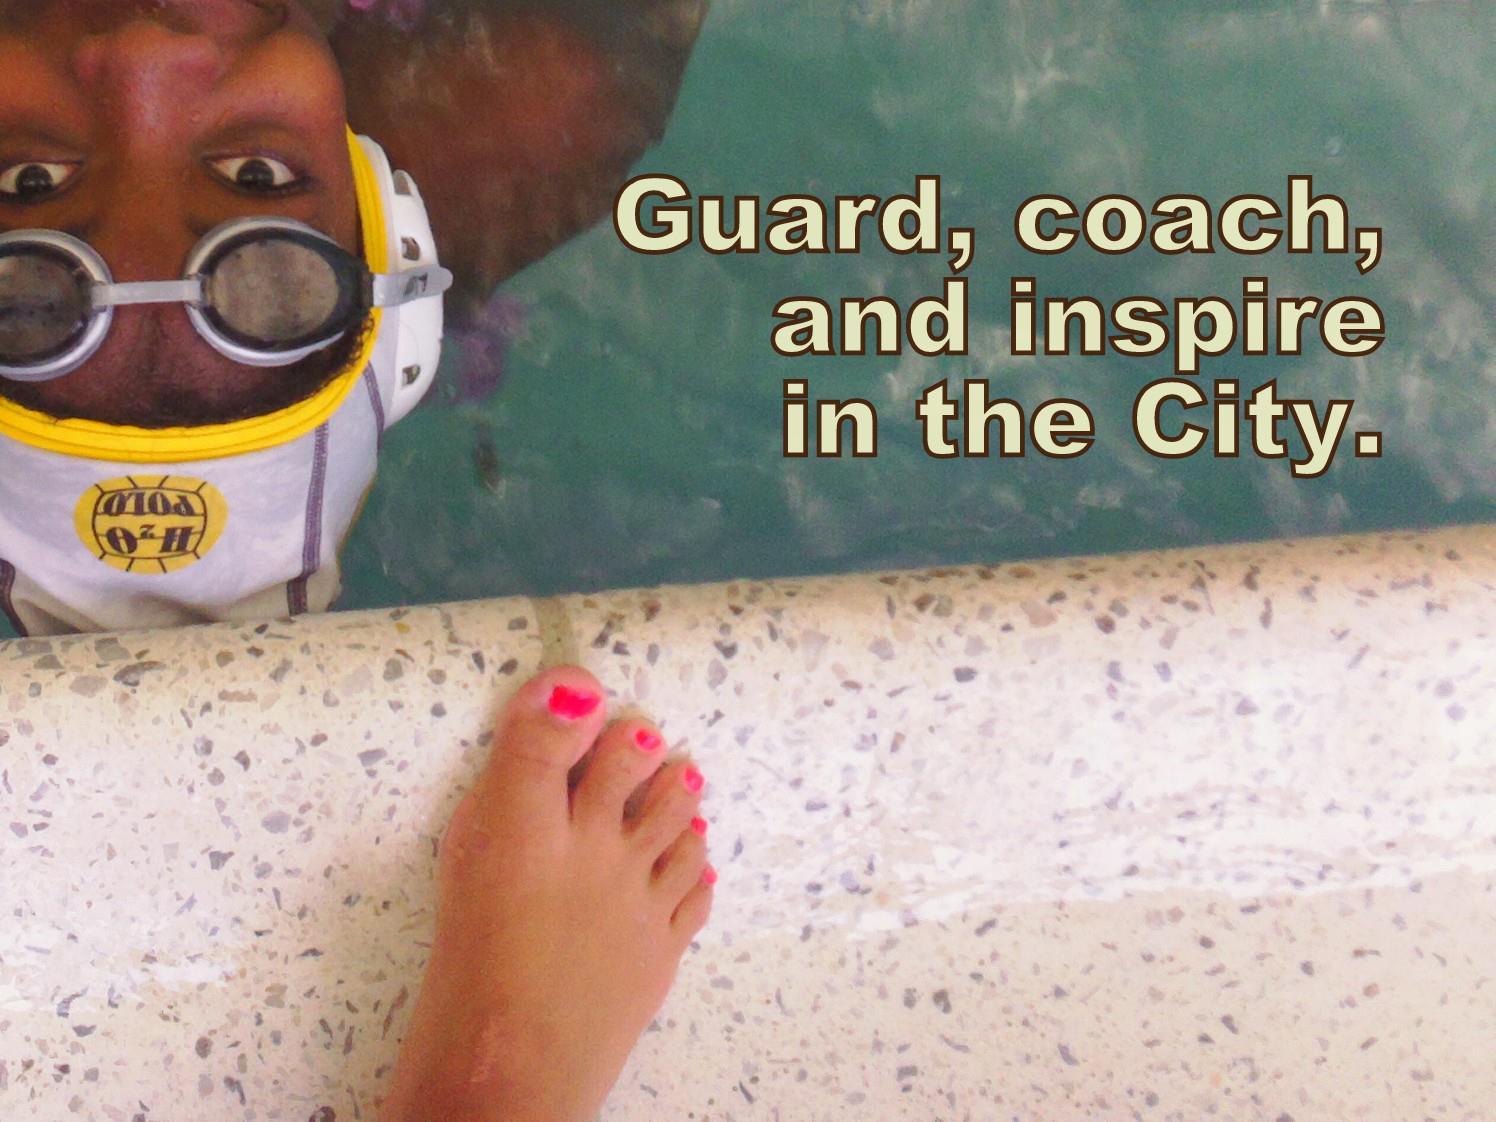 Guard, coach, inspire